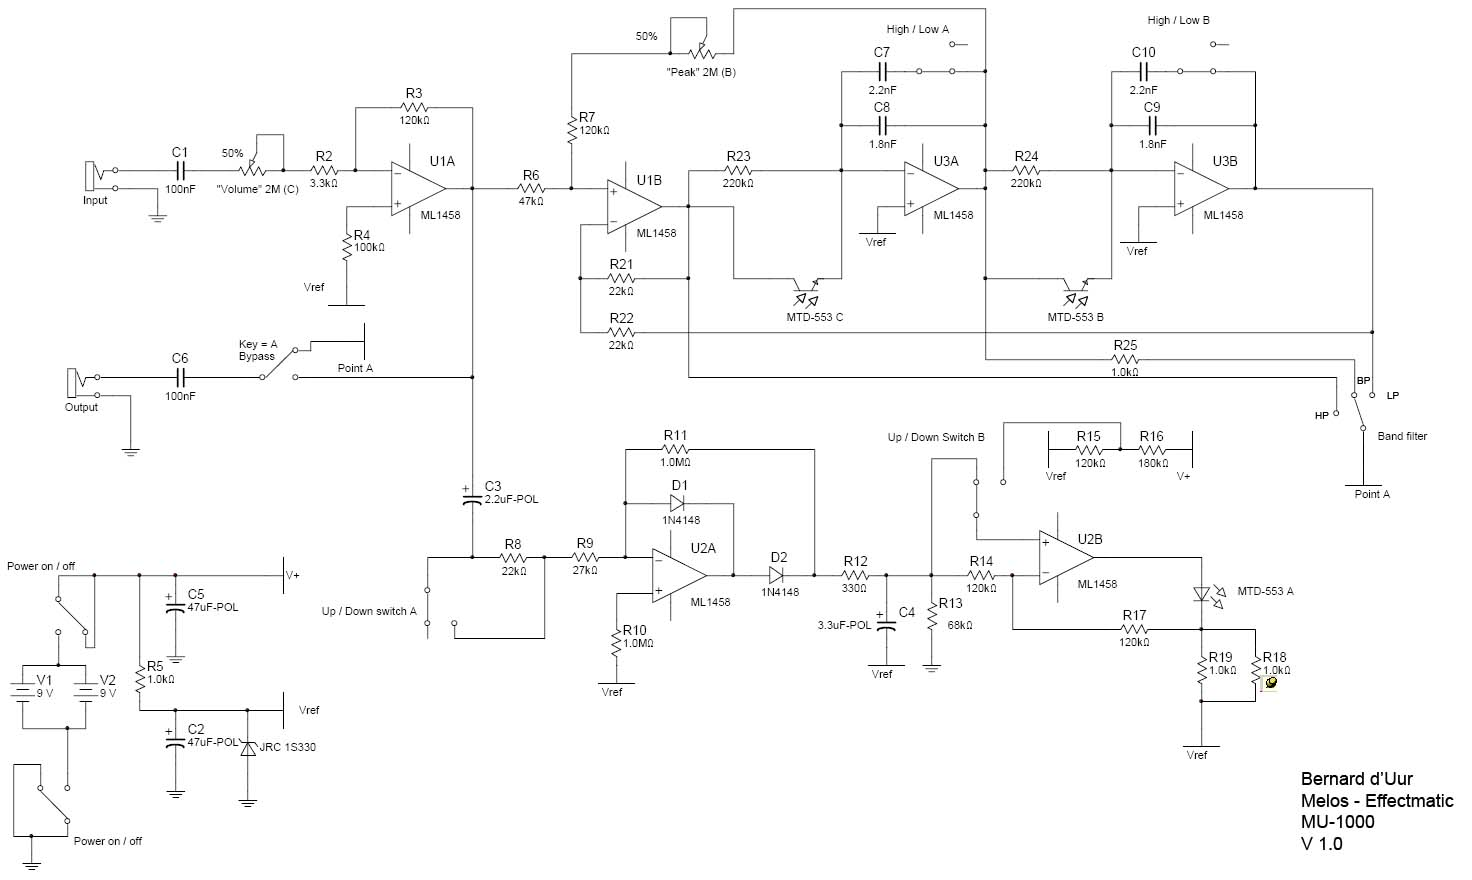 Wiring Honeywell Thermostat Rth111 Series Rth111b Diagram